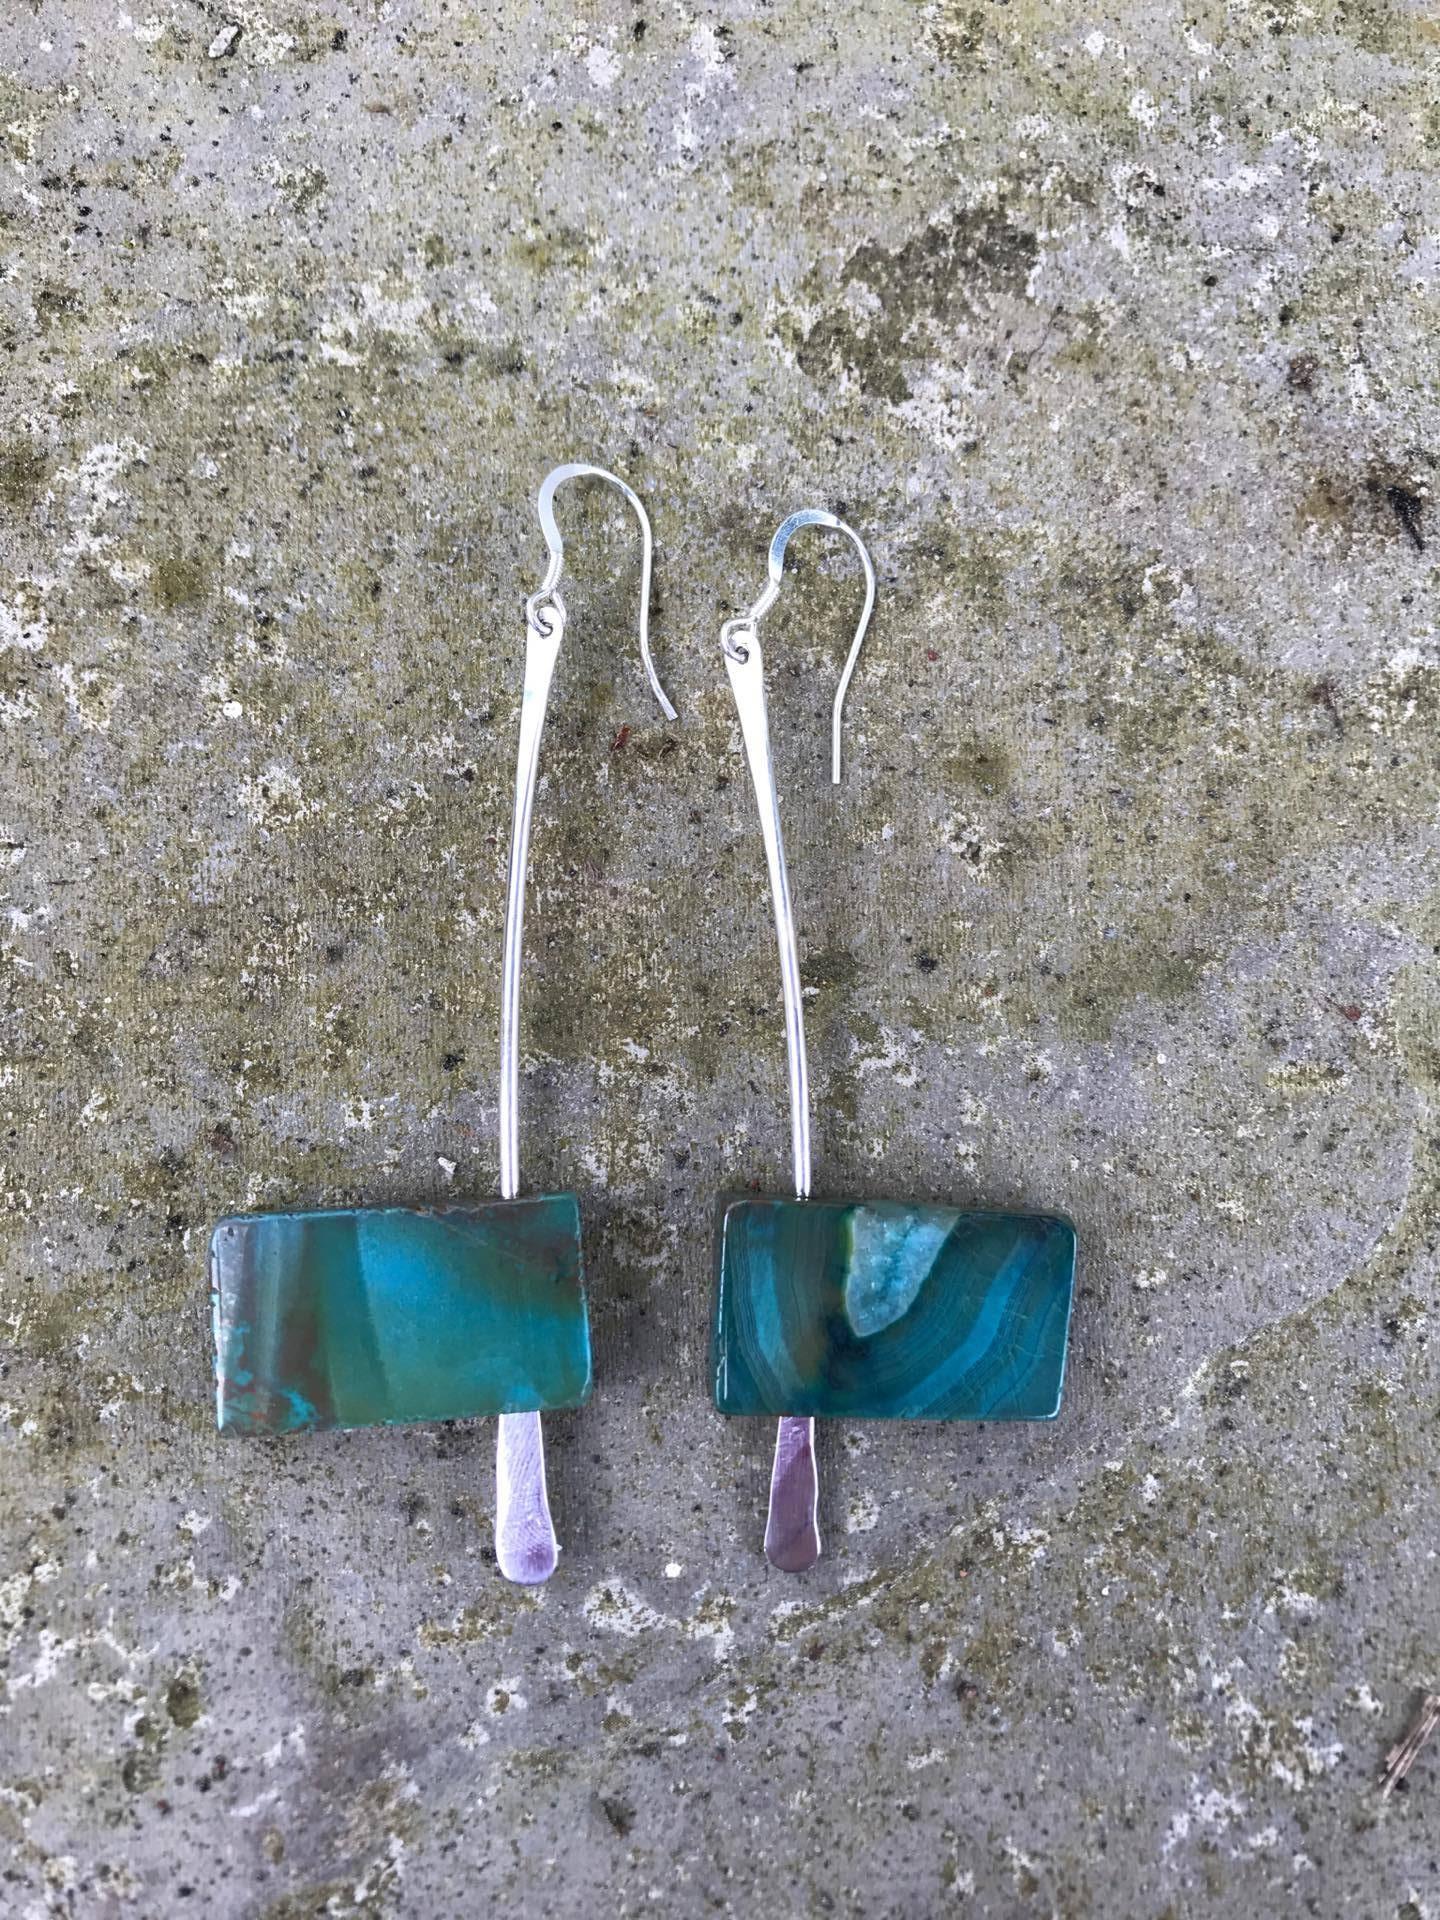 Earrings - E04 - Silver and rectangular green agate dangly earrings